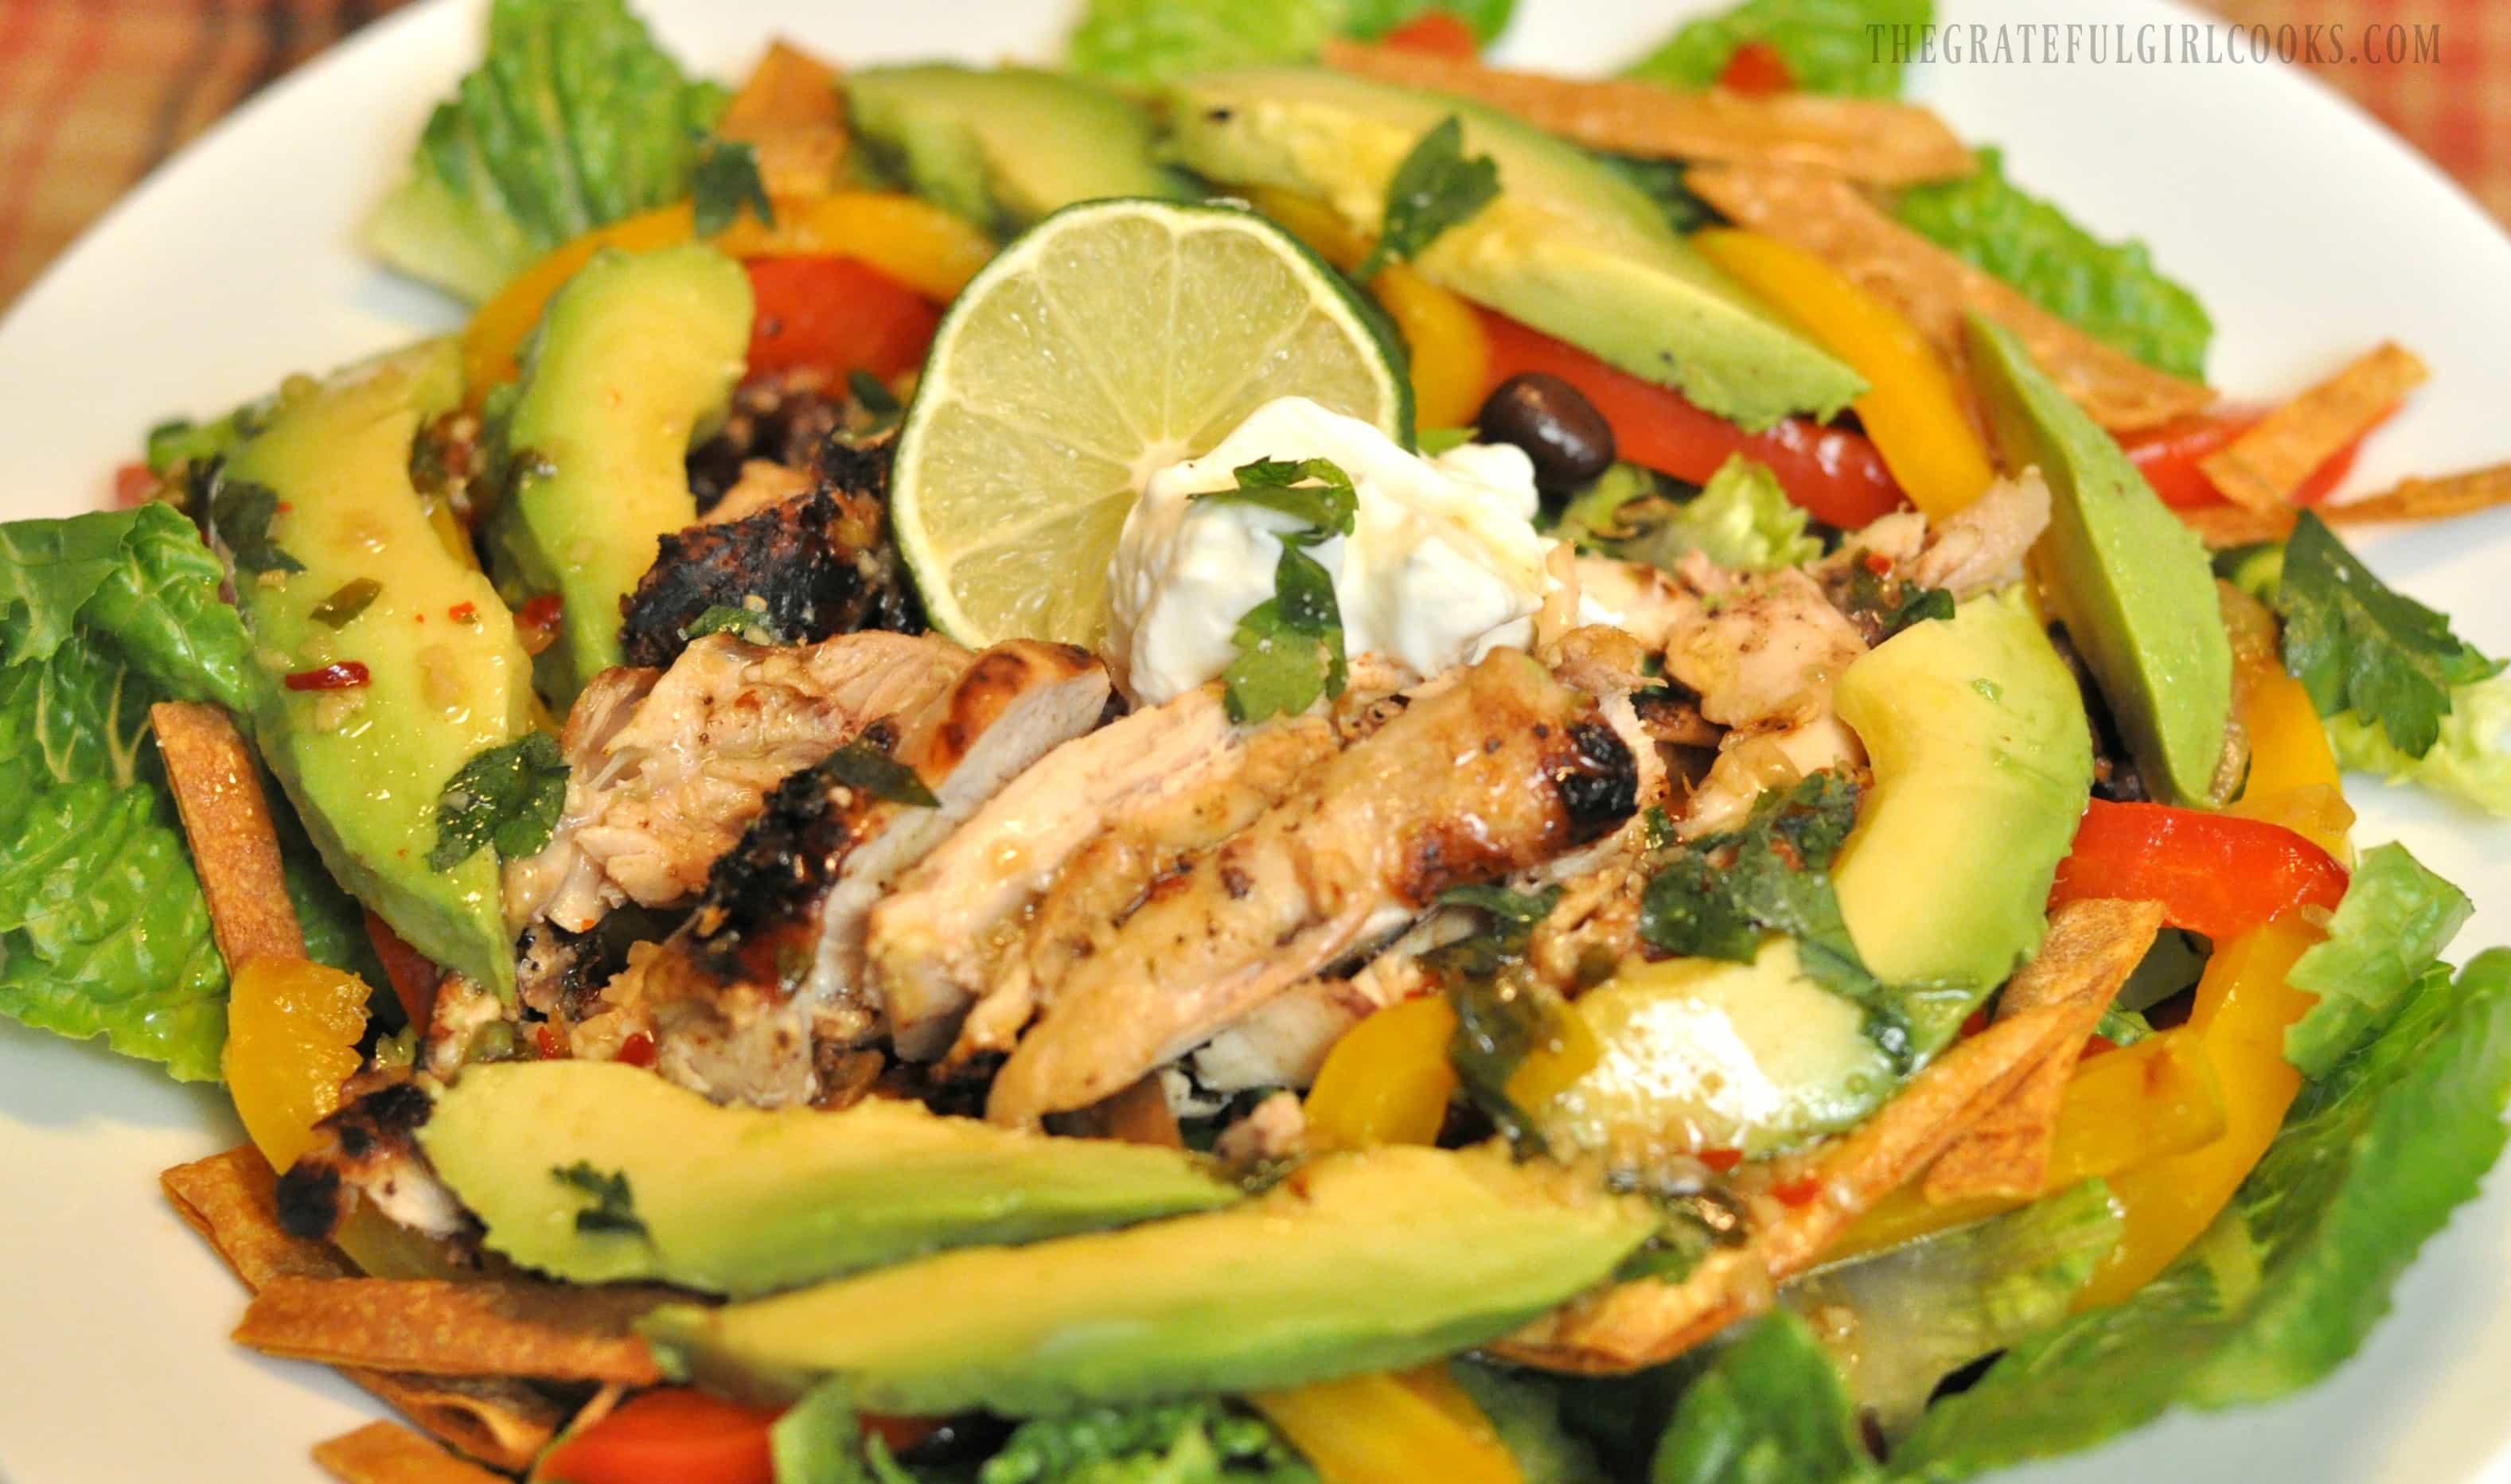 Grilled Chili & Lime Chicken Fajita Salad / The Grateful Girl Cooks!